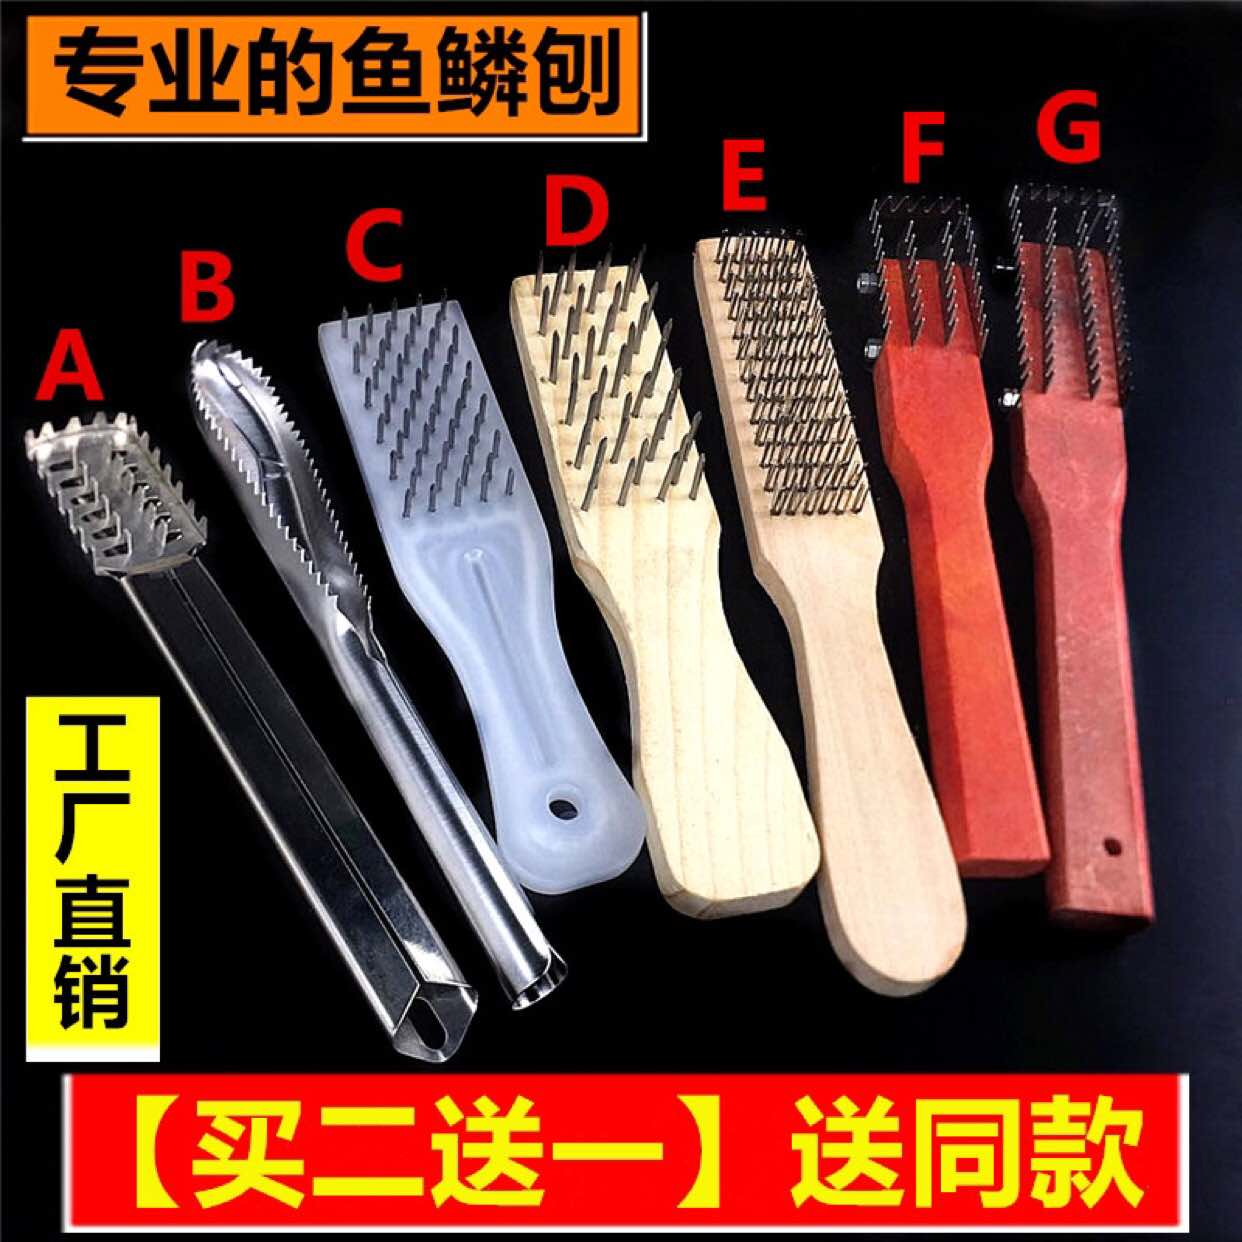 Ножи для чистки рыбы Артикул 594839195425